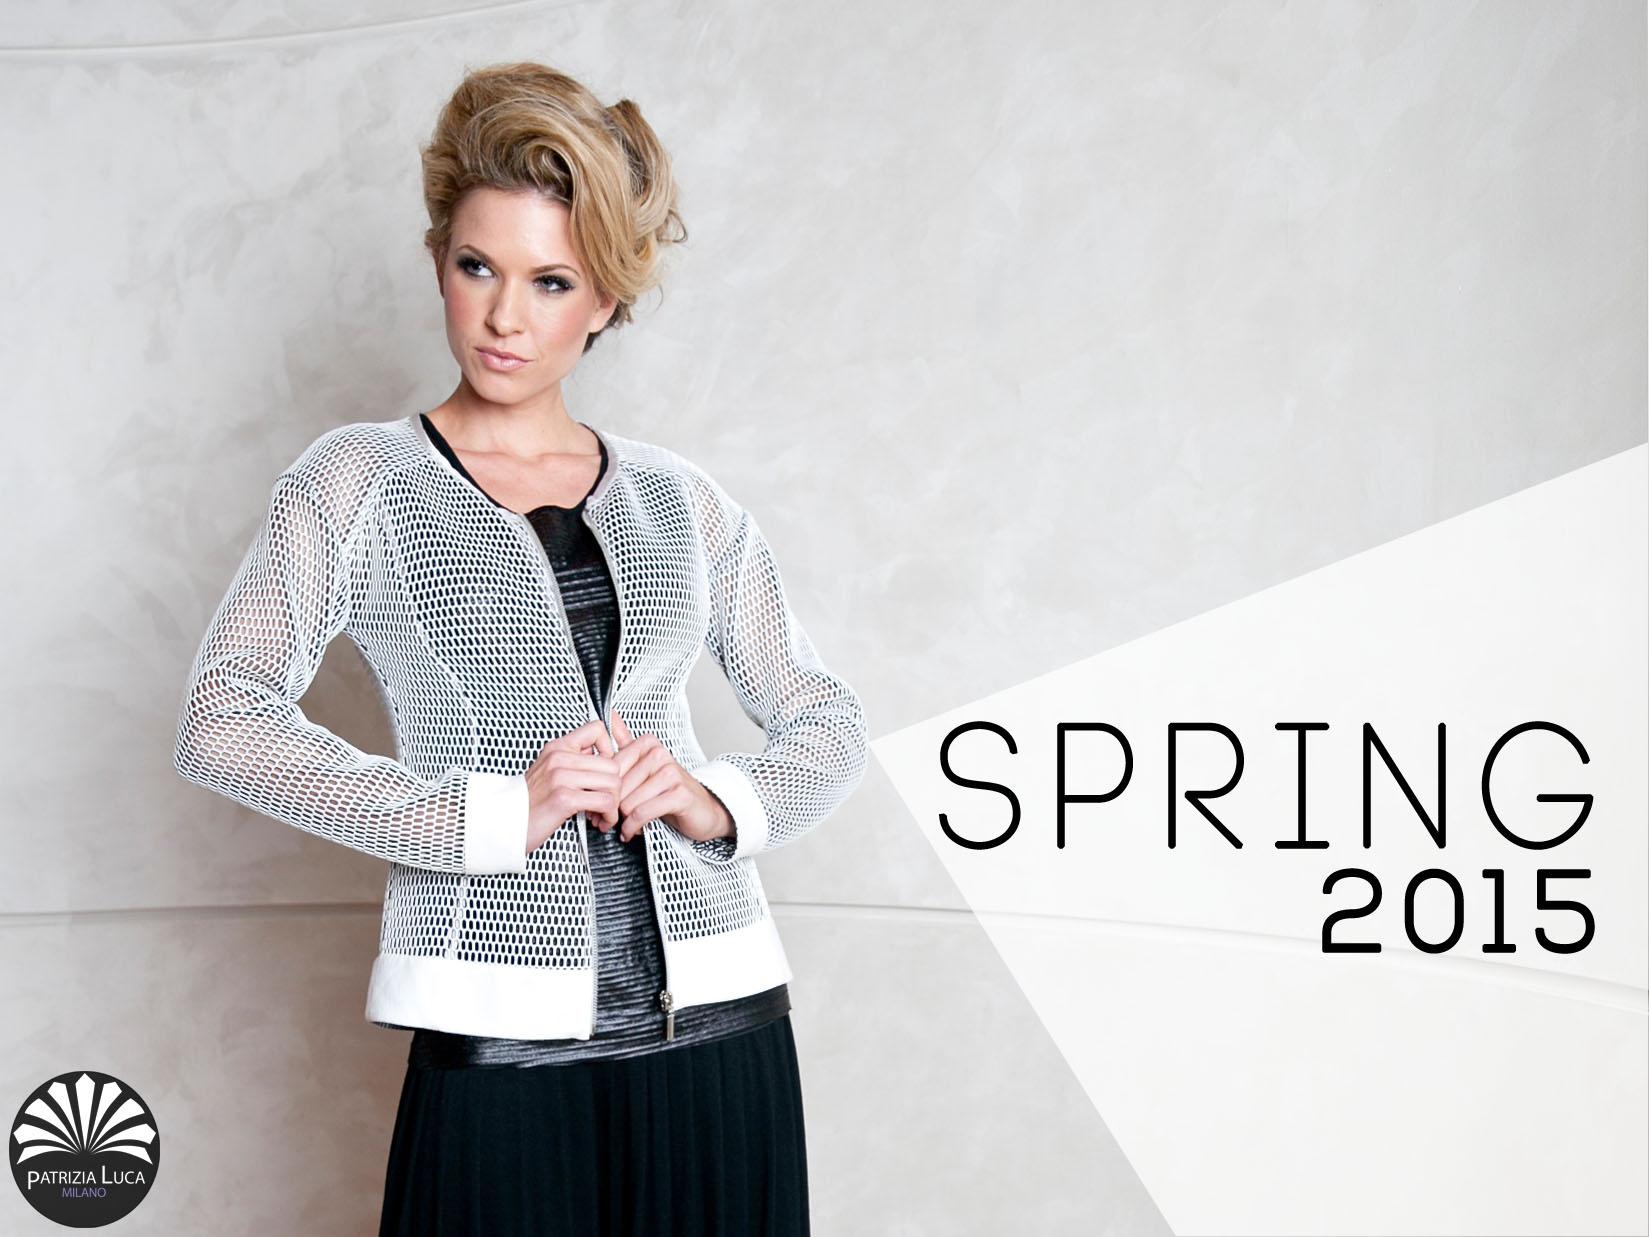 Patrizia-luca-spring-2015-lookbook-1.jpg